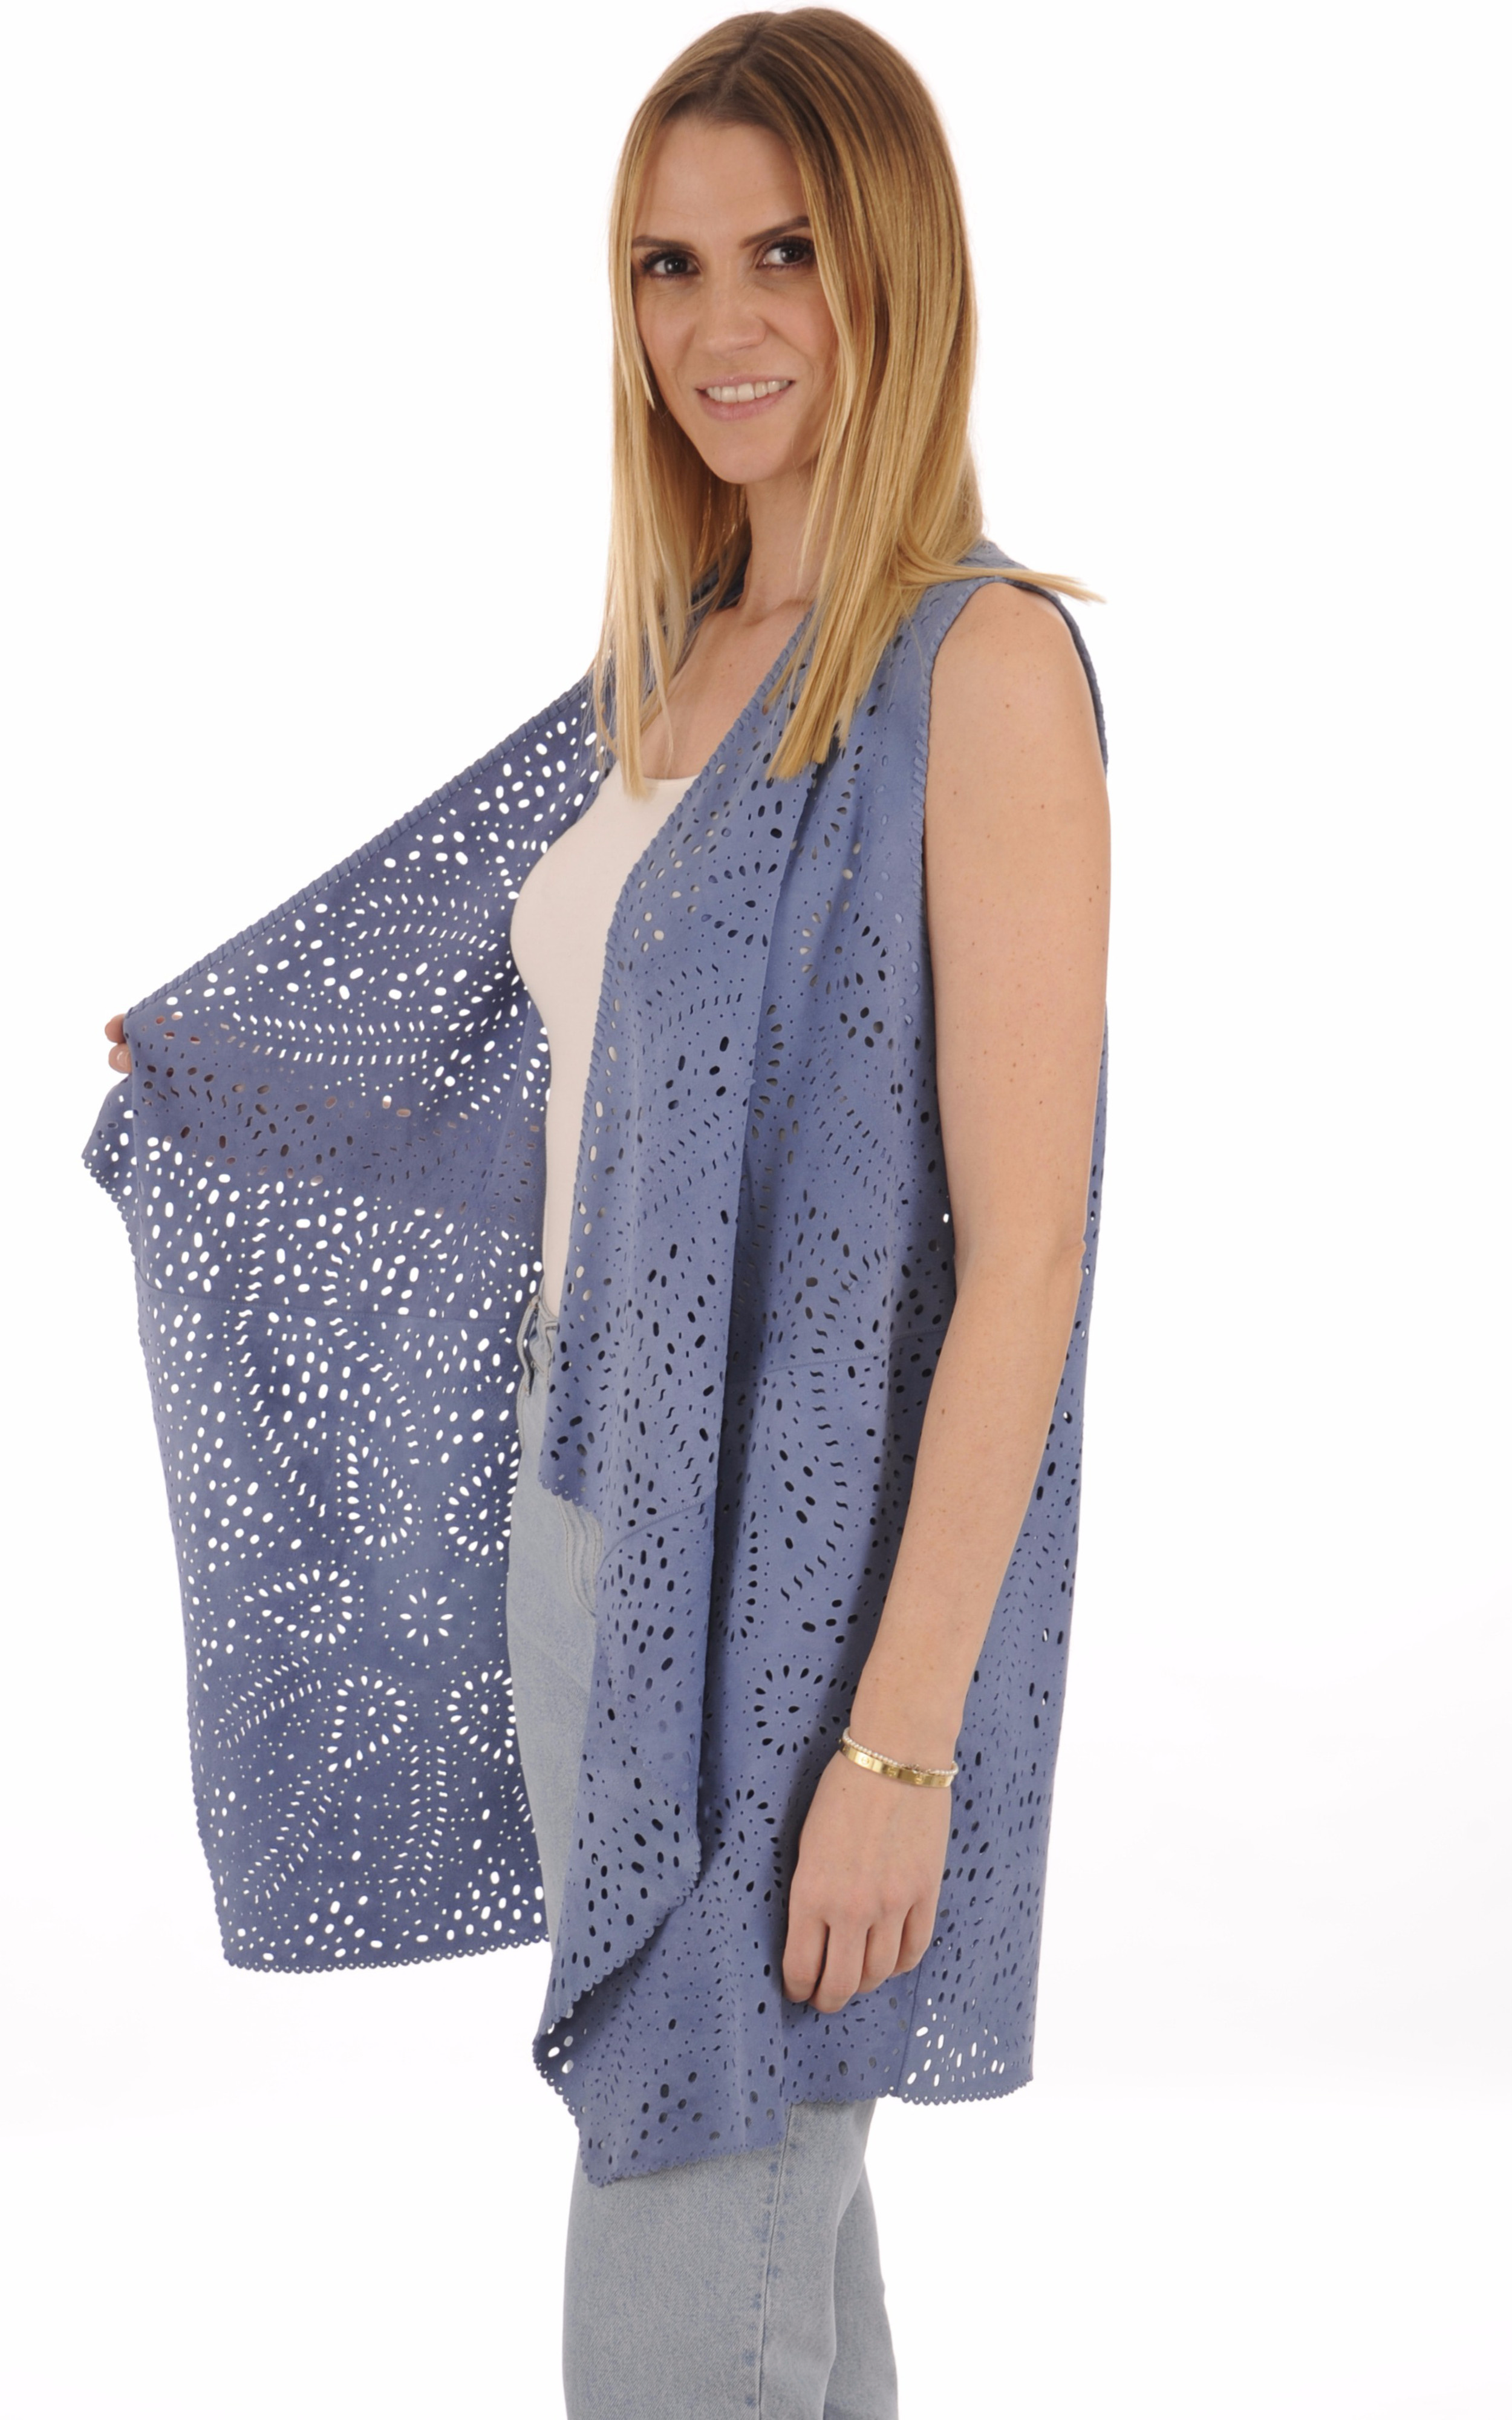 Gilet Cuir Velours Bleu Jeans Femme Treasures Design